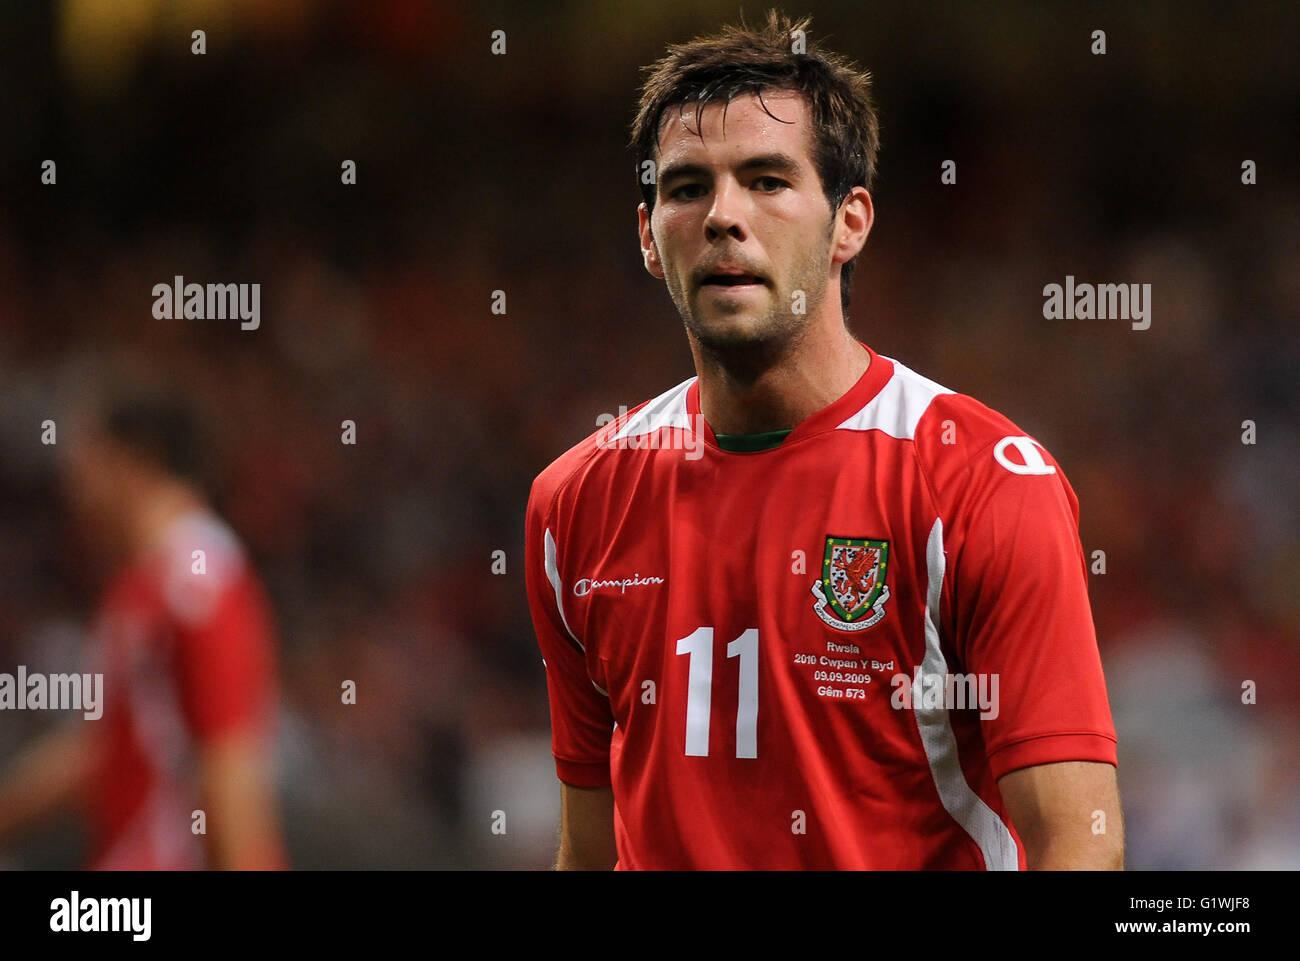 Joe Ledley Wales football player. - Stock Image